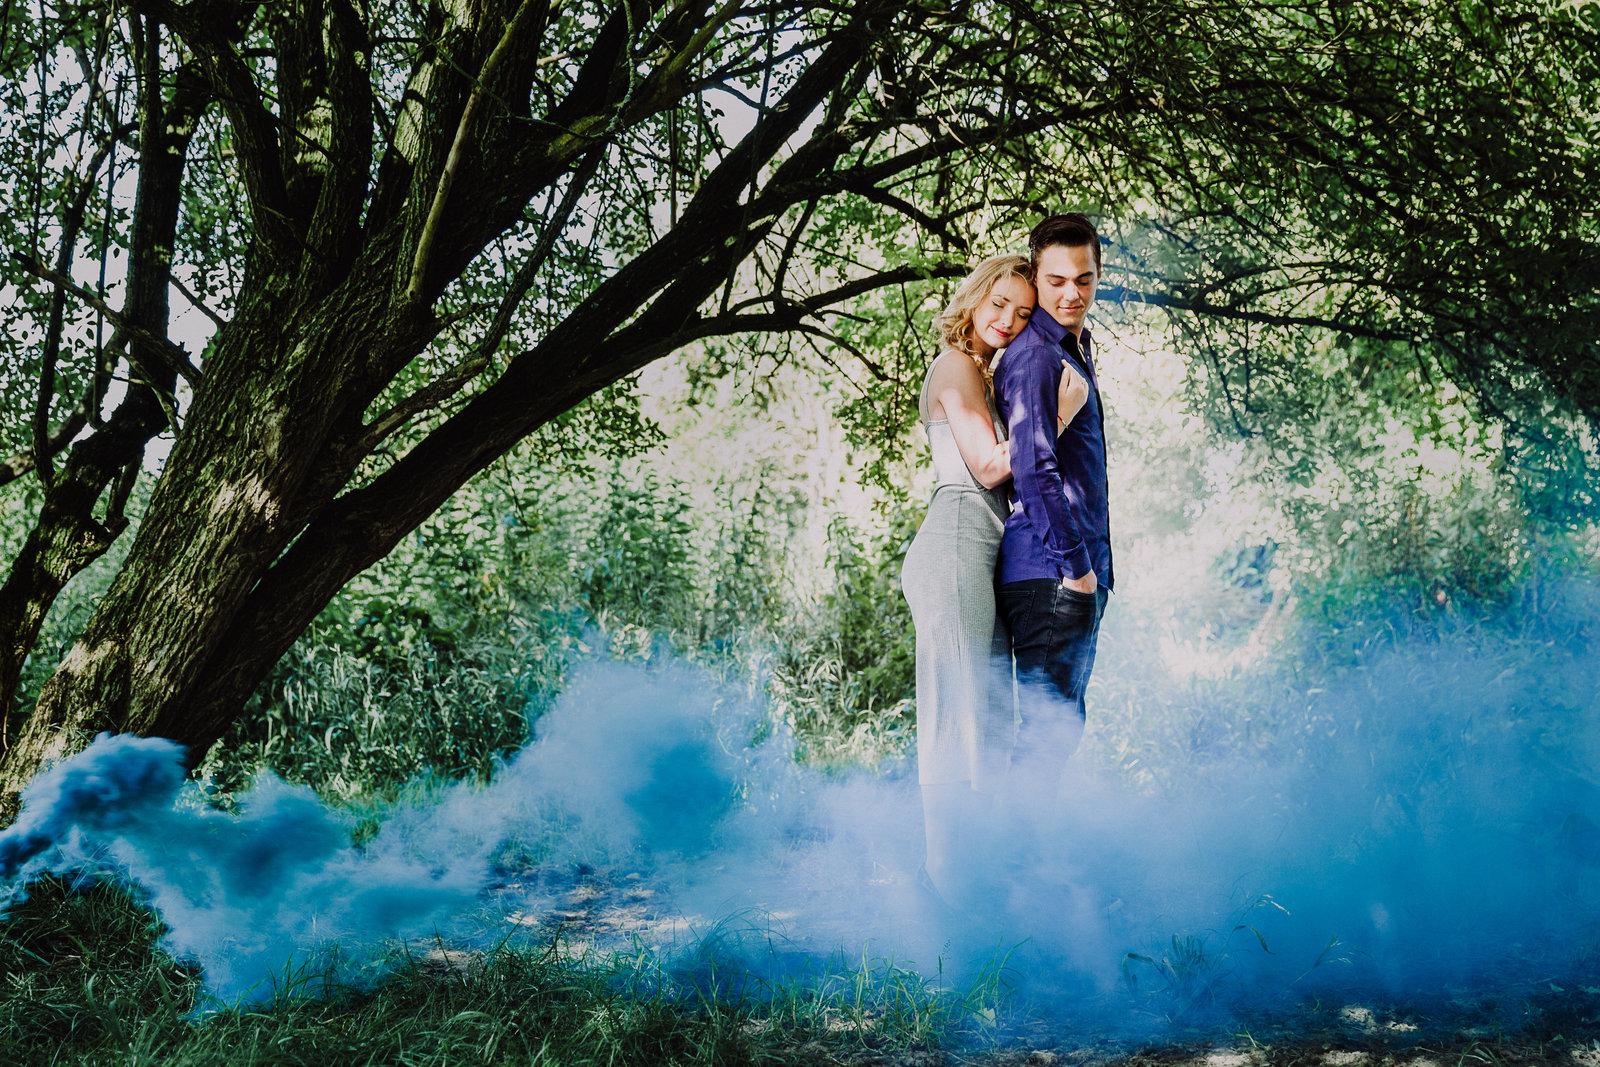 Loveshoot met blauwe rookbom in de natuur Copyright Nanda Zee-Fritse | FOTOZEE